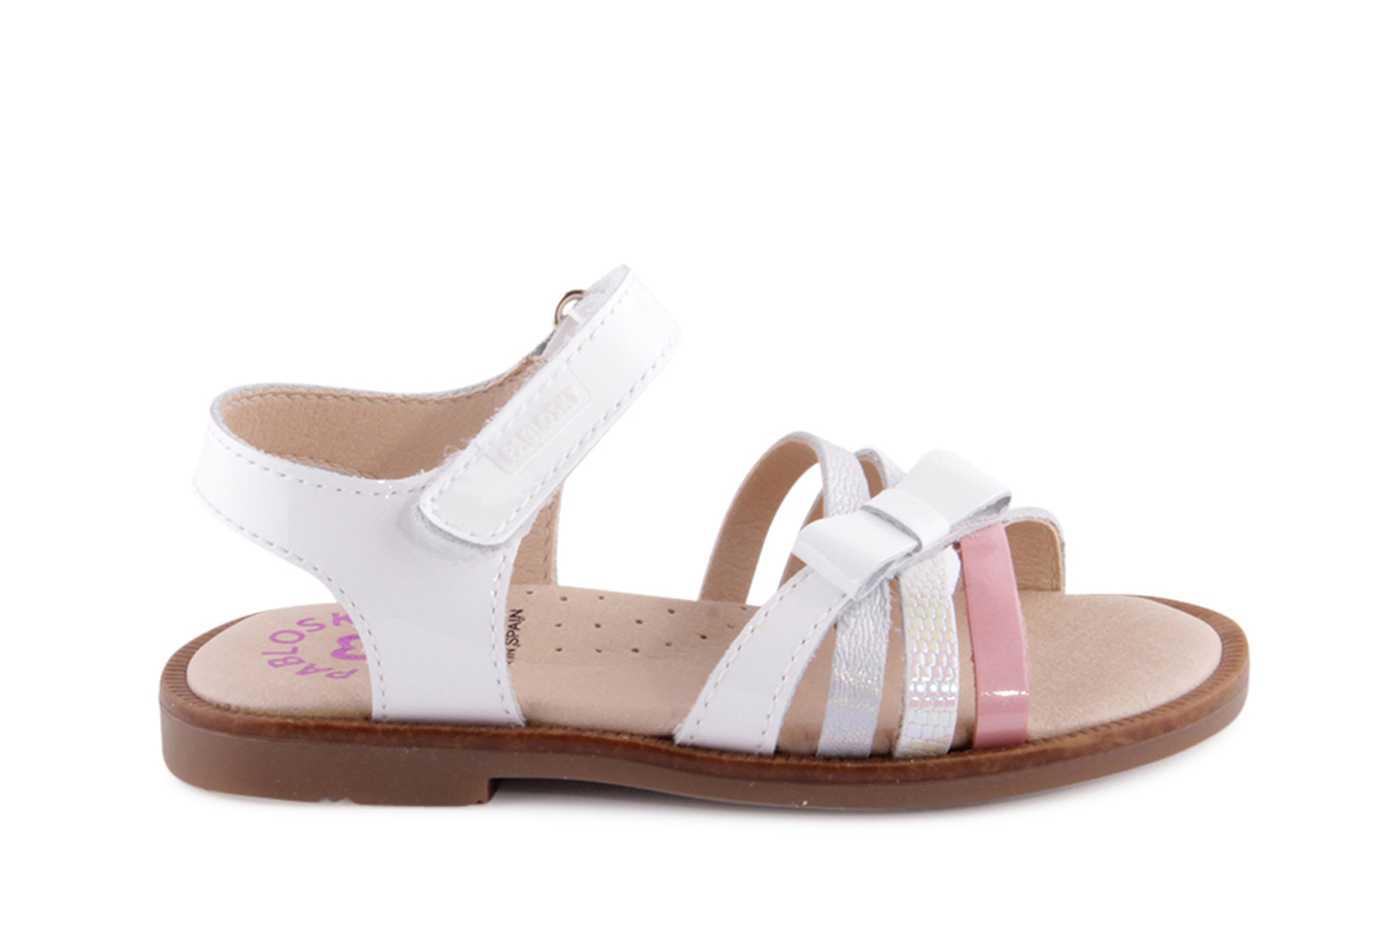 9d7d3496c Comprar zapato tipo JOVEN NIÑA estilo SANDALIA COLOR BLANCO CHAROL ...